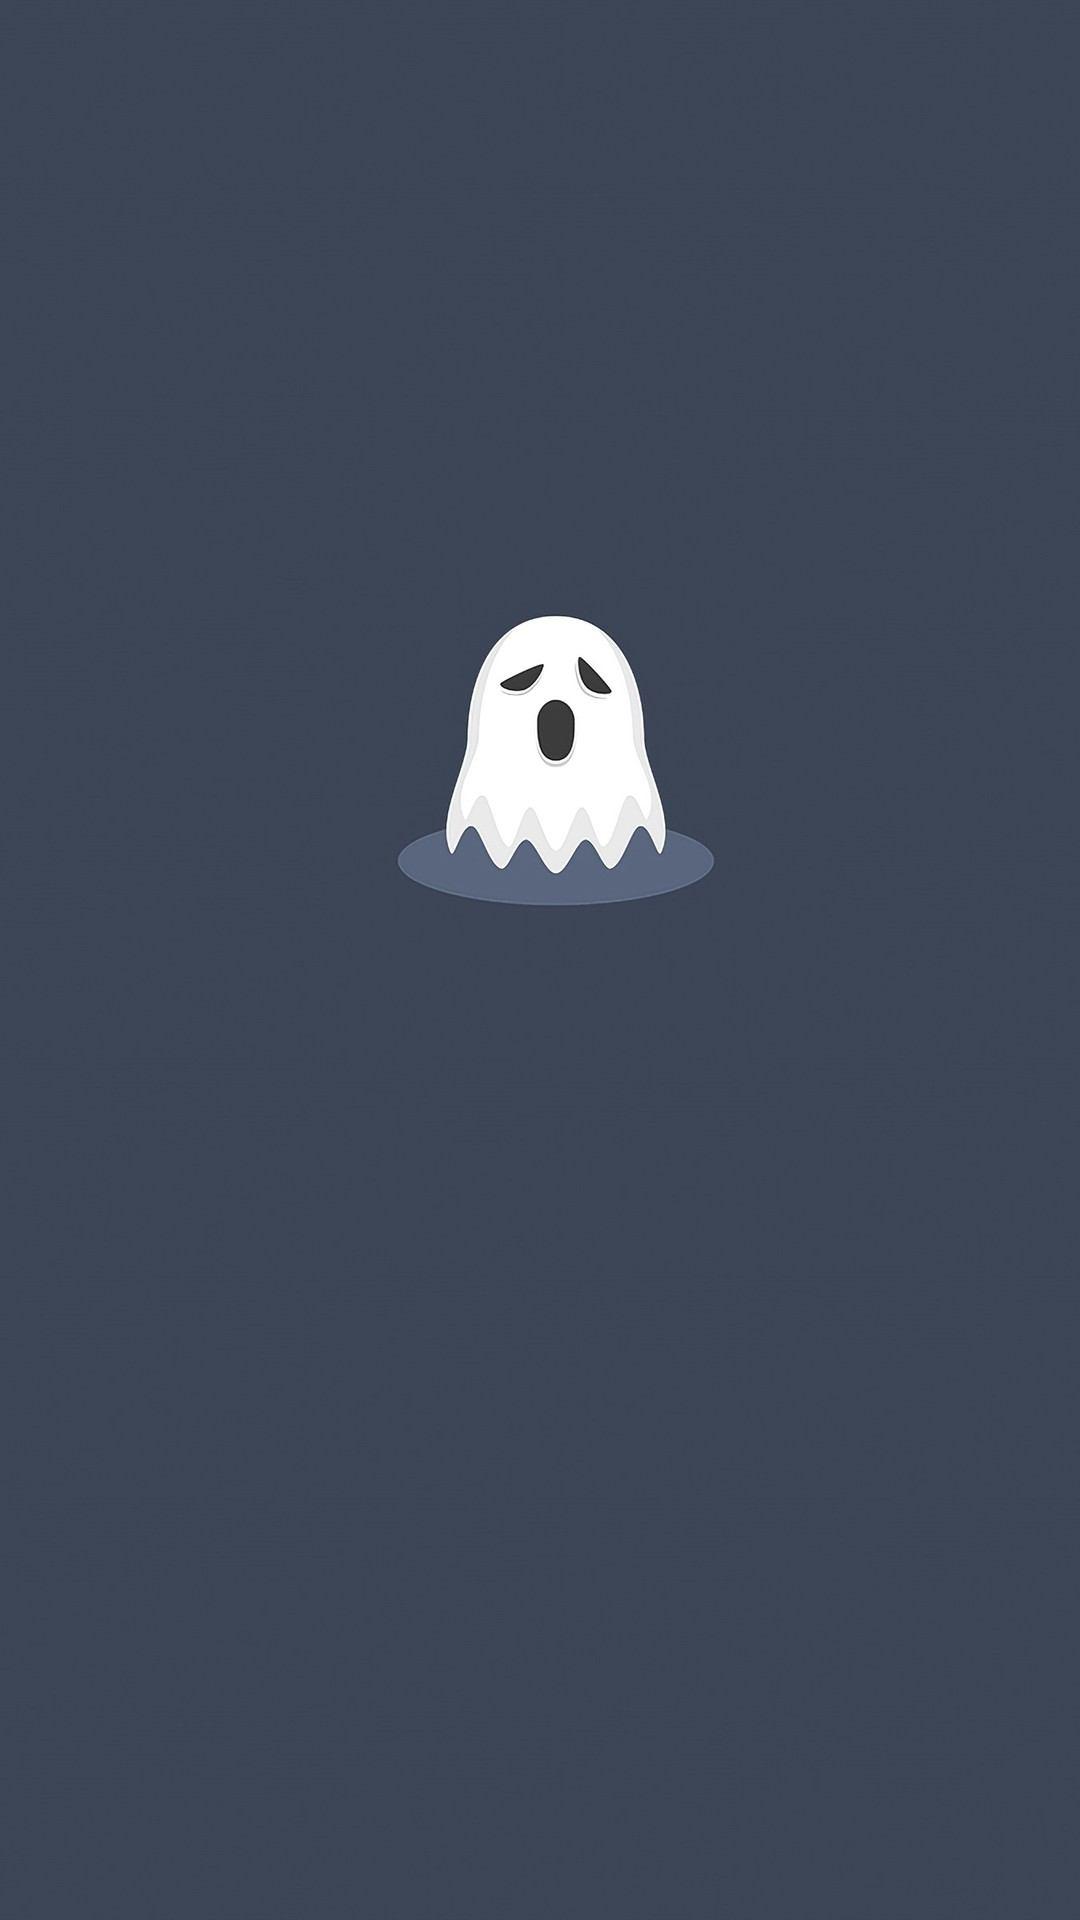 ghost minimal 4k l7 1080x1920 - Pack de Fondos de Pantalla Minimalistas (+100 Imagenes)